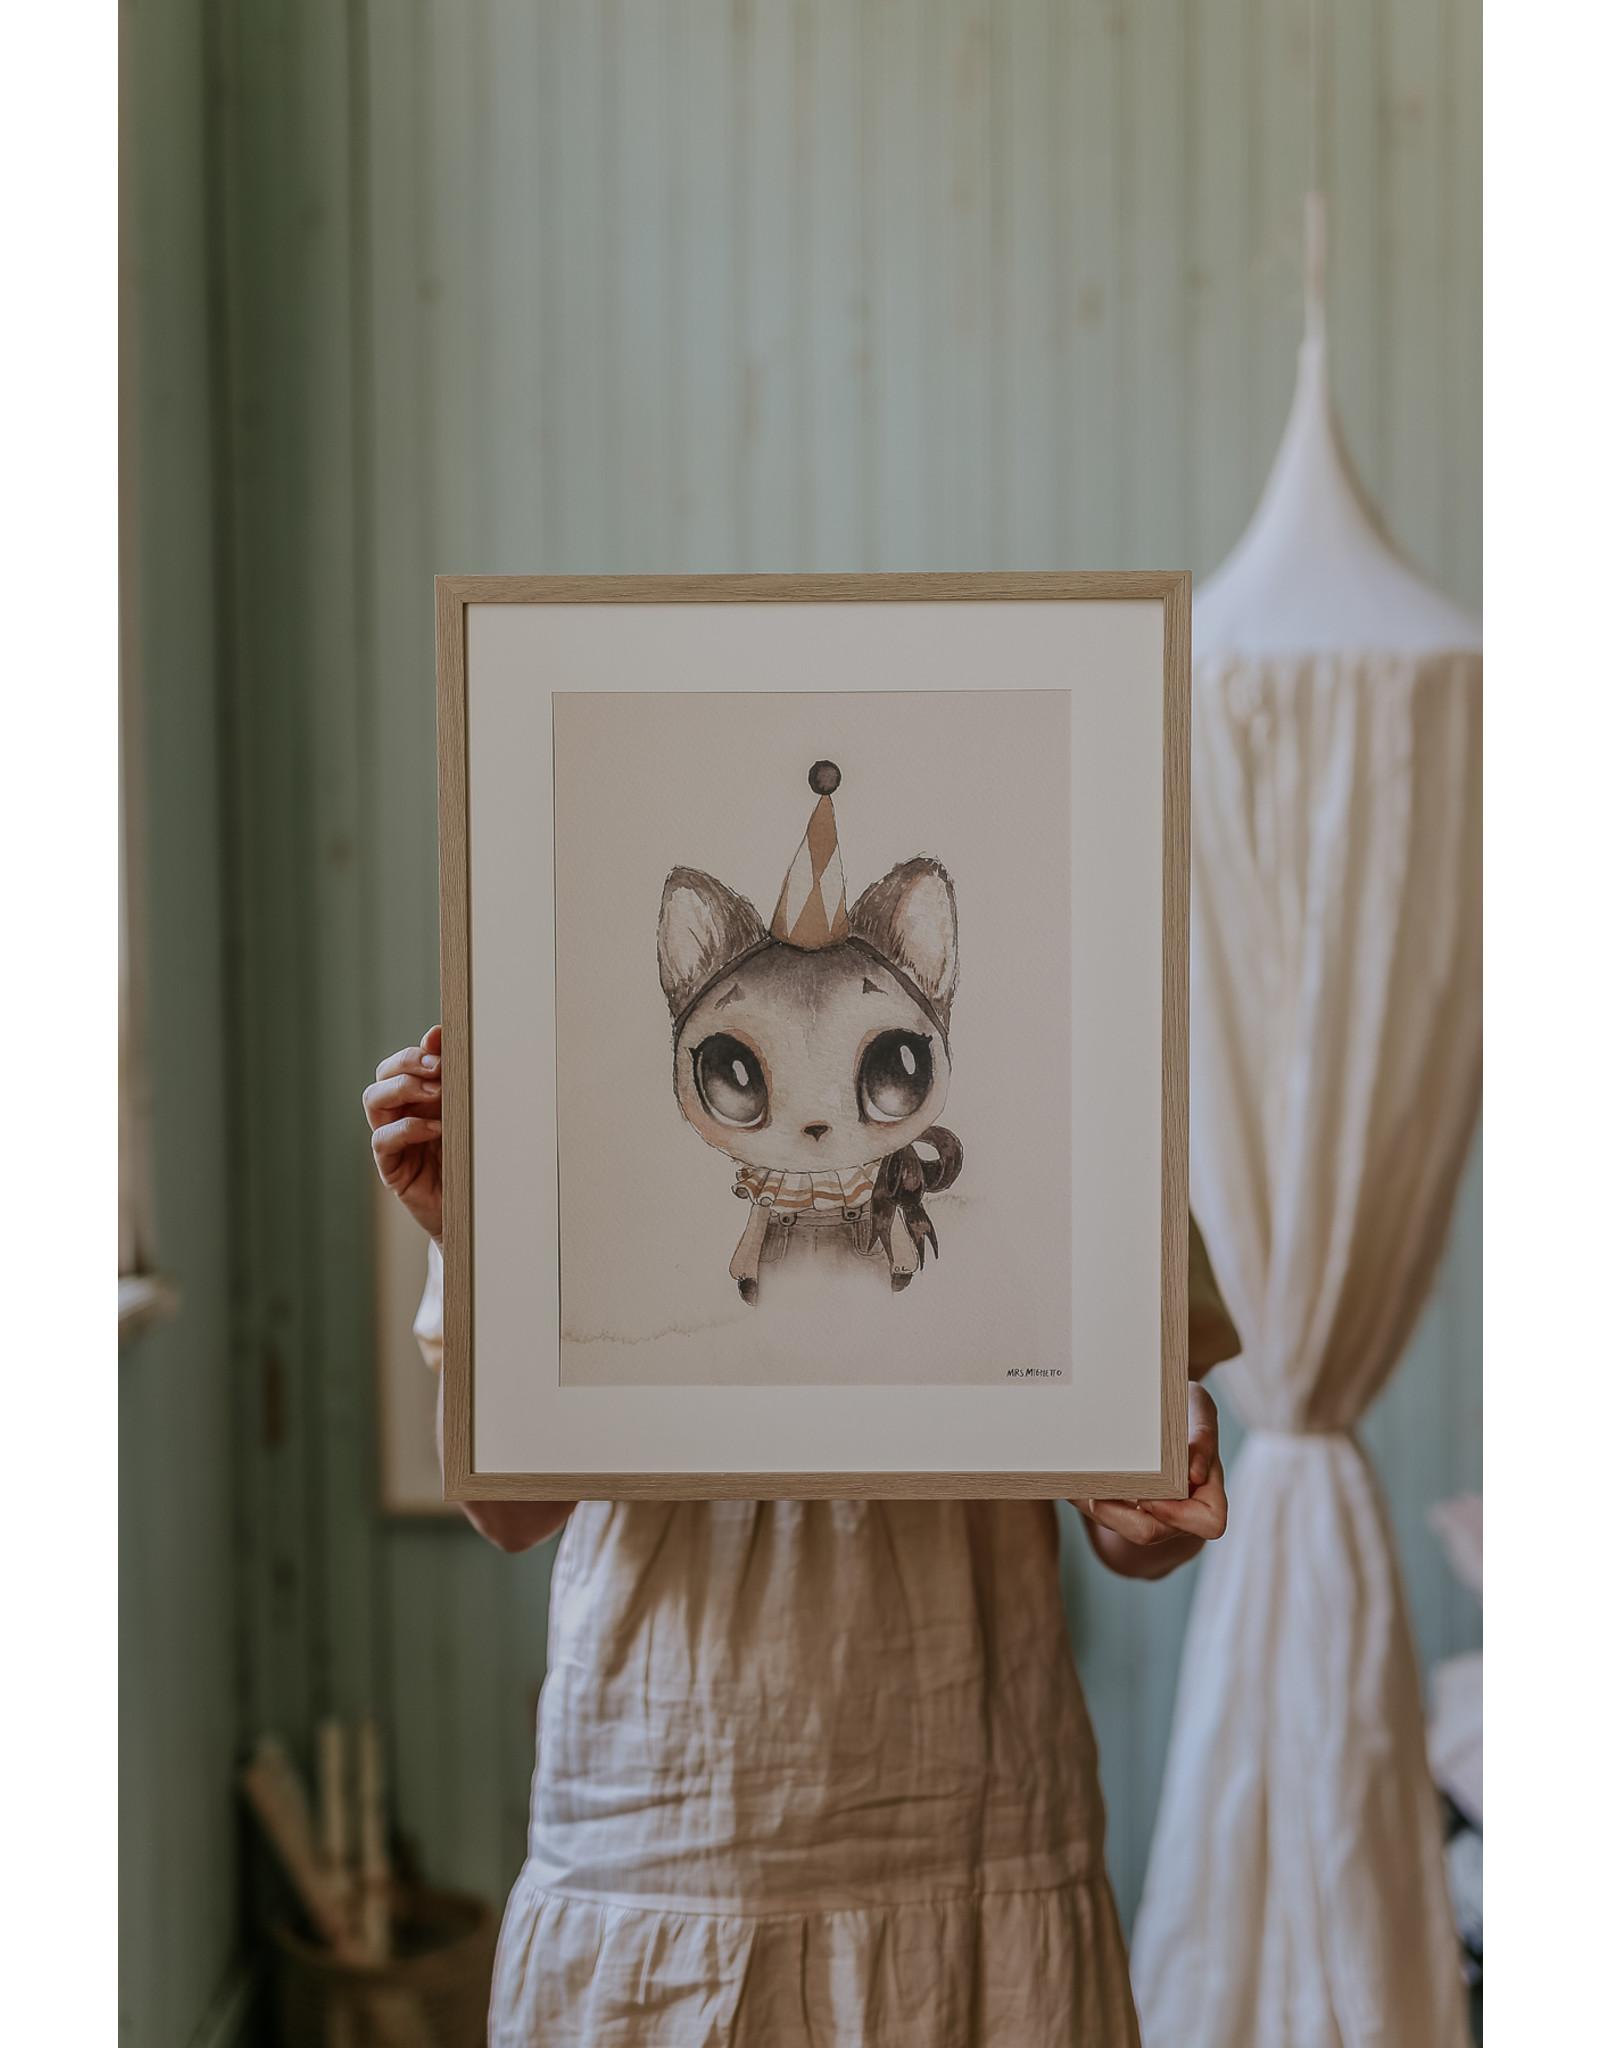 MRS MIGHETTO Dear Meow 50x70 cm